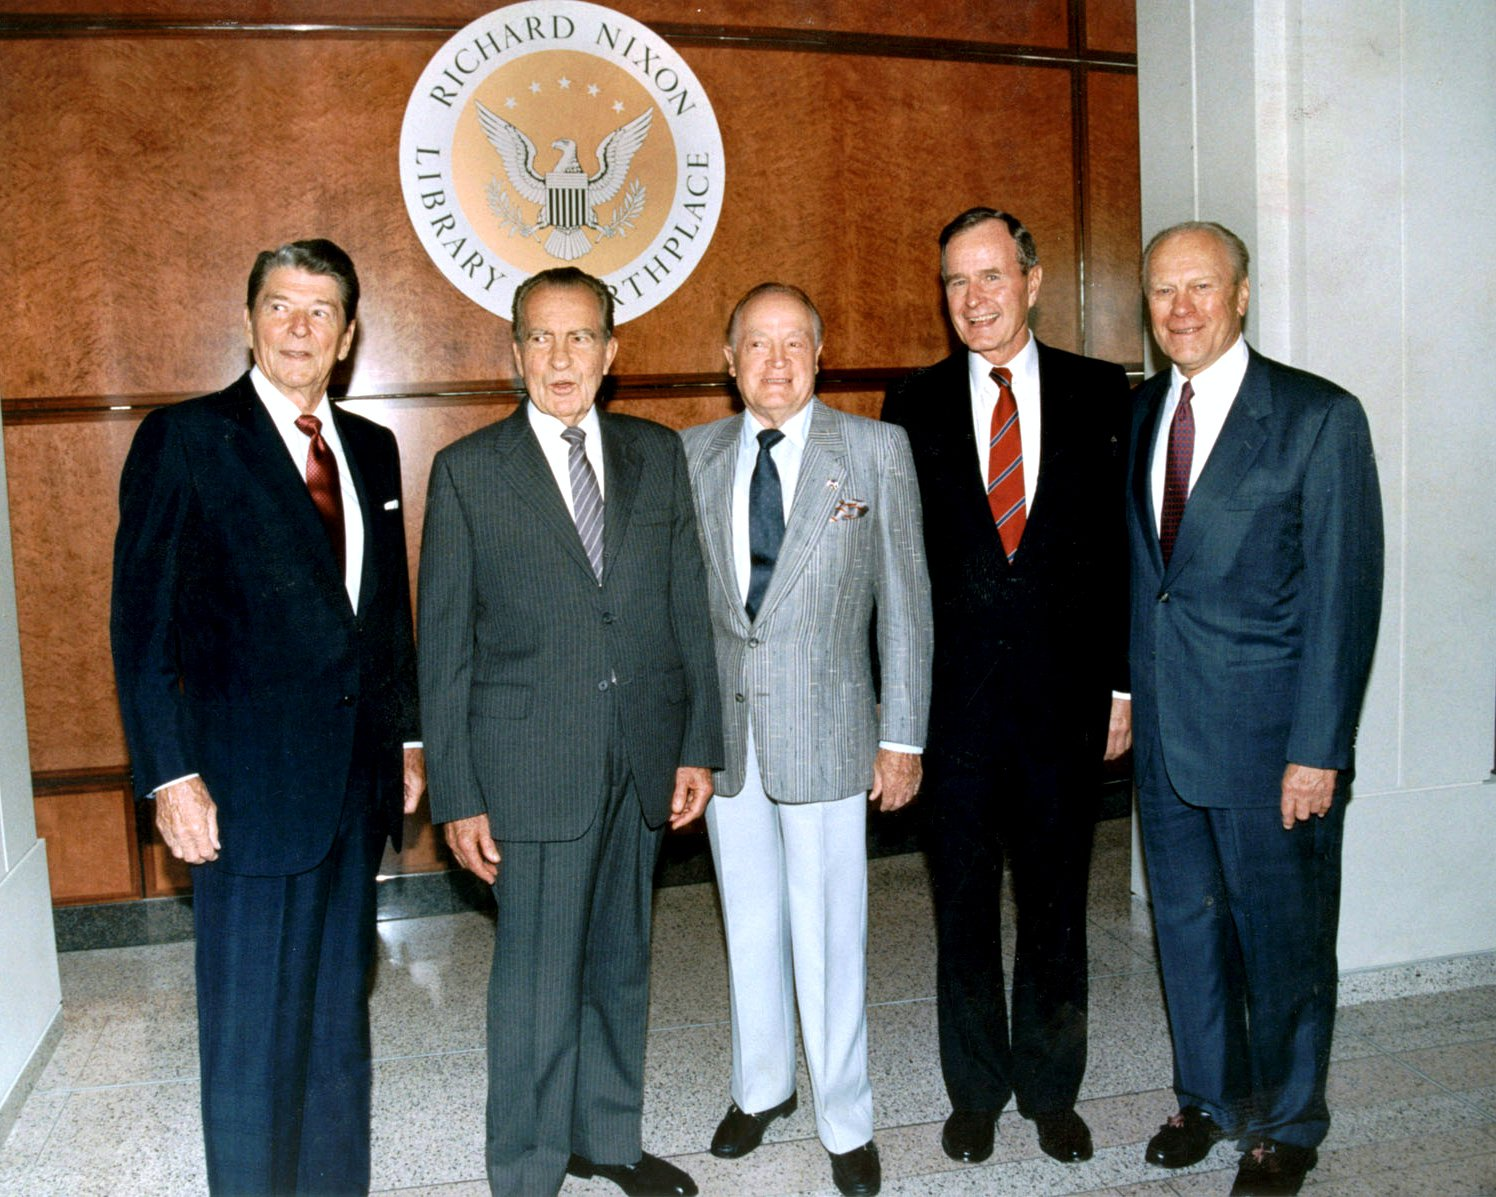 PRESIDENTS REAGAN, NIXON, BUSH & FORD WITH BOB HOPE 1990 - 8X10 PHOTO (EP-588)